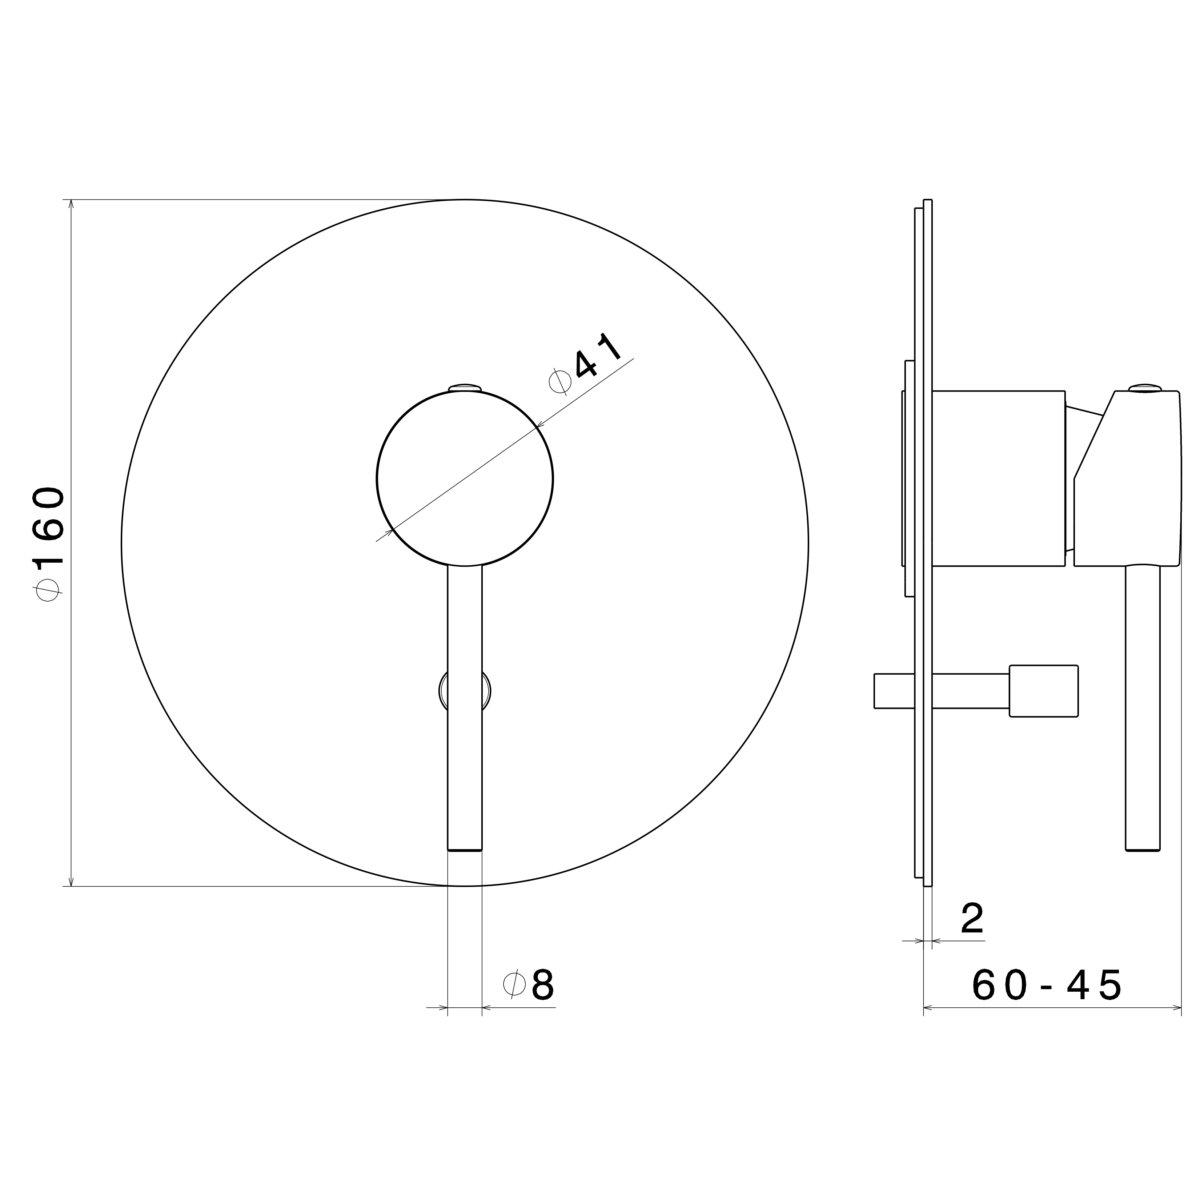 4270E.01.093 Newform XT Mini X Black Diverter Mixer_Stiles_TechDrawing_Image